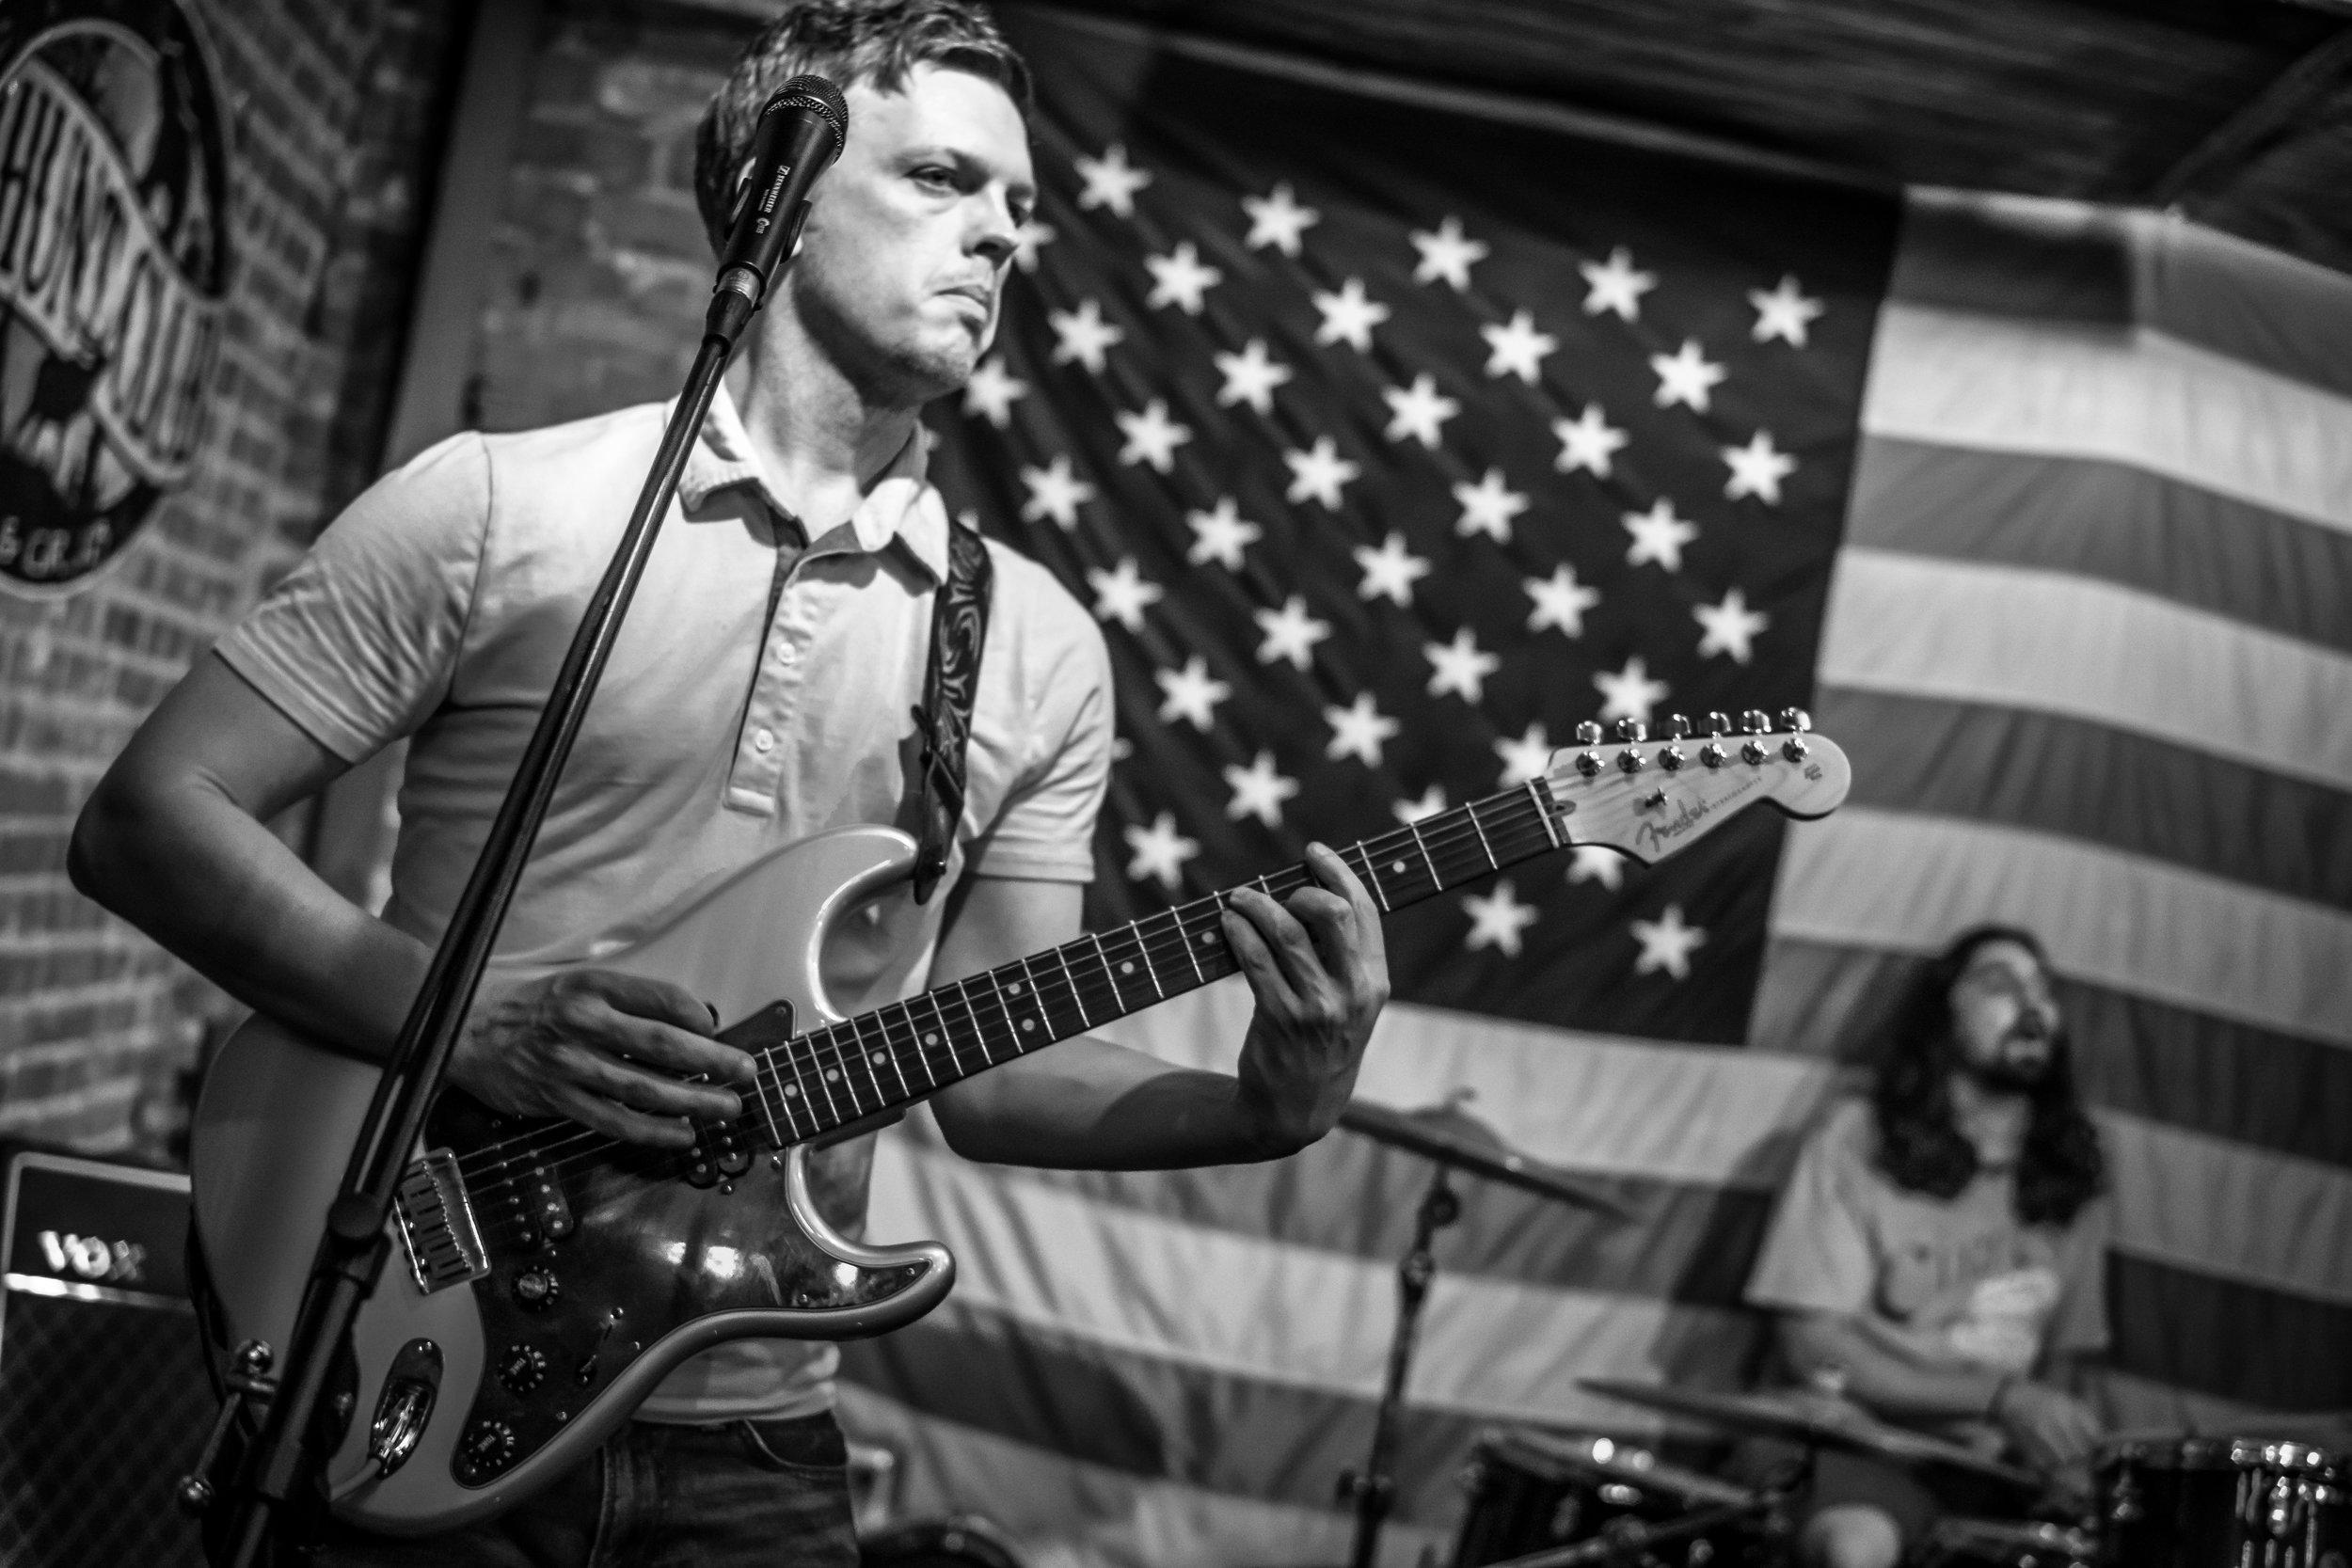 FM Pilots - Tulsa Rock Band - The Hunt Club Tulsa, OK 061016-8.jpg